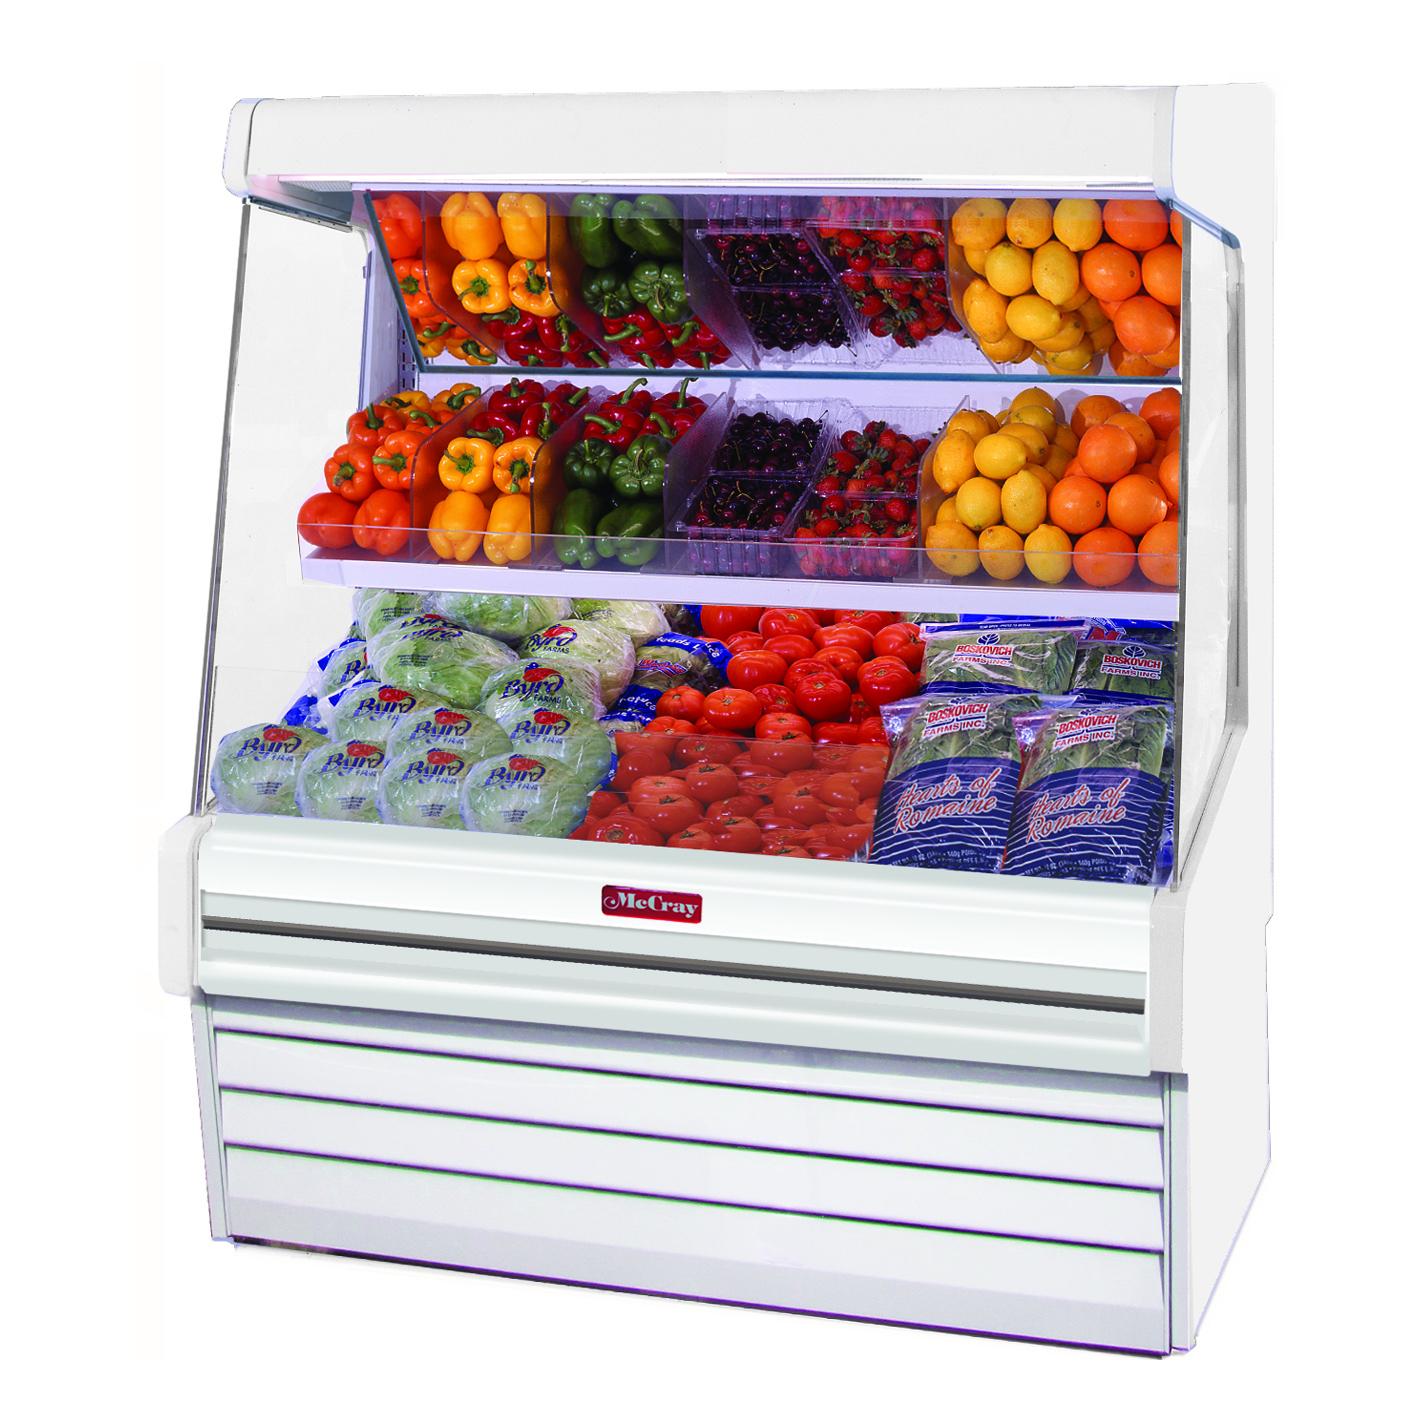 Howard-McCray SC-OM30E-4L-S-LED merchandiser, open refrigerated display